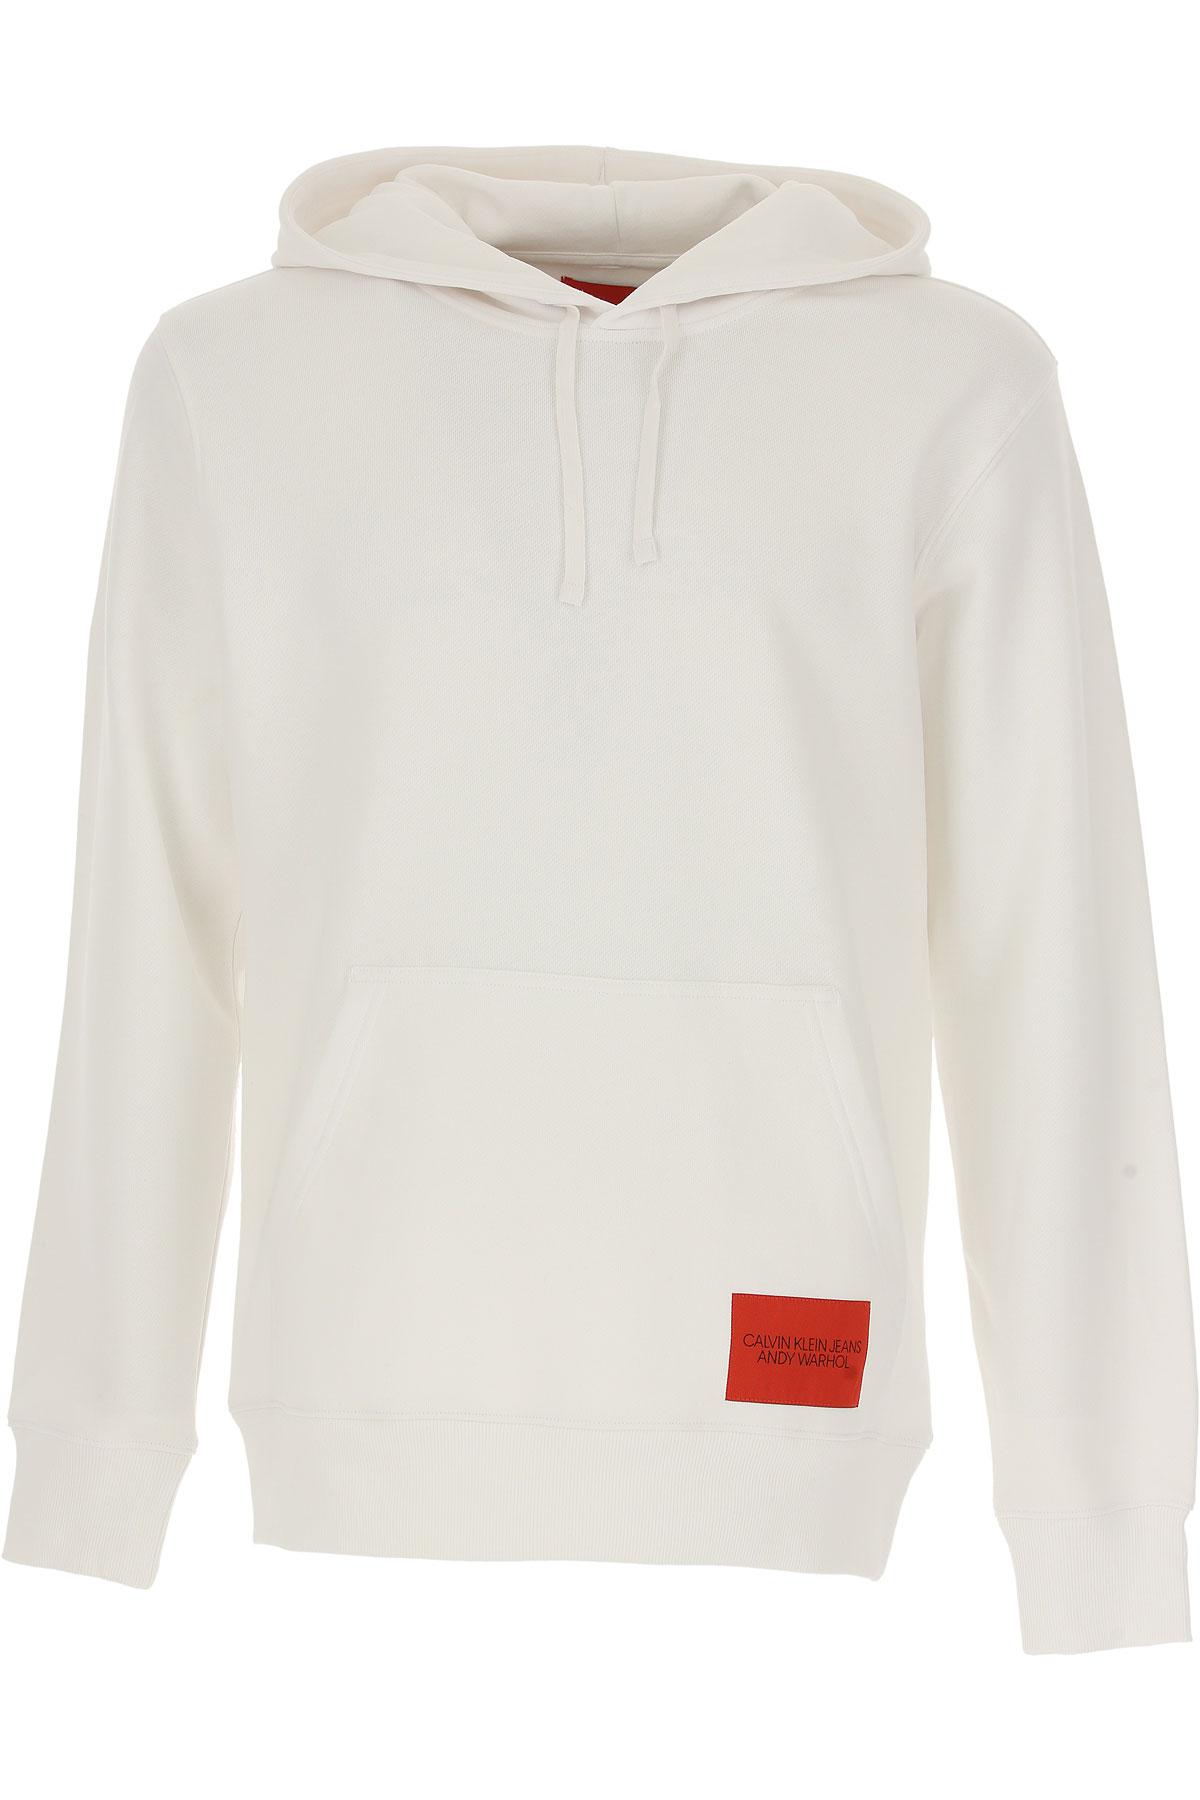 Calvin Klein Sweatshirt for Men, White, Cotton, 2017, L M S XL USA-467172